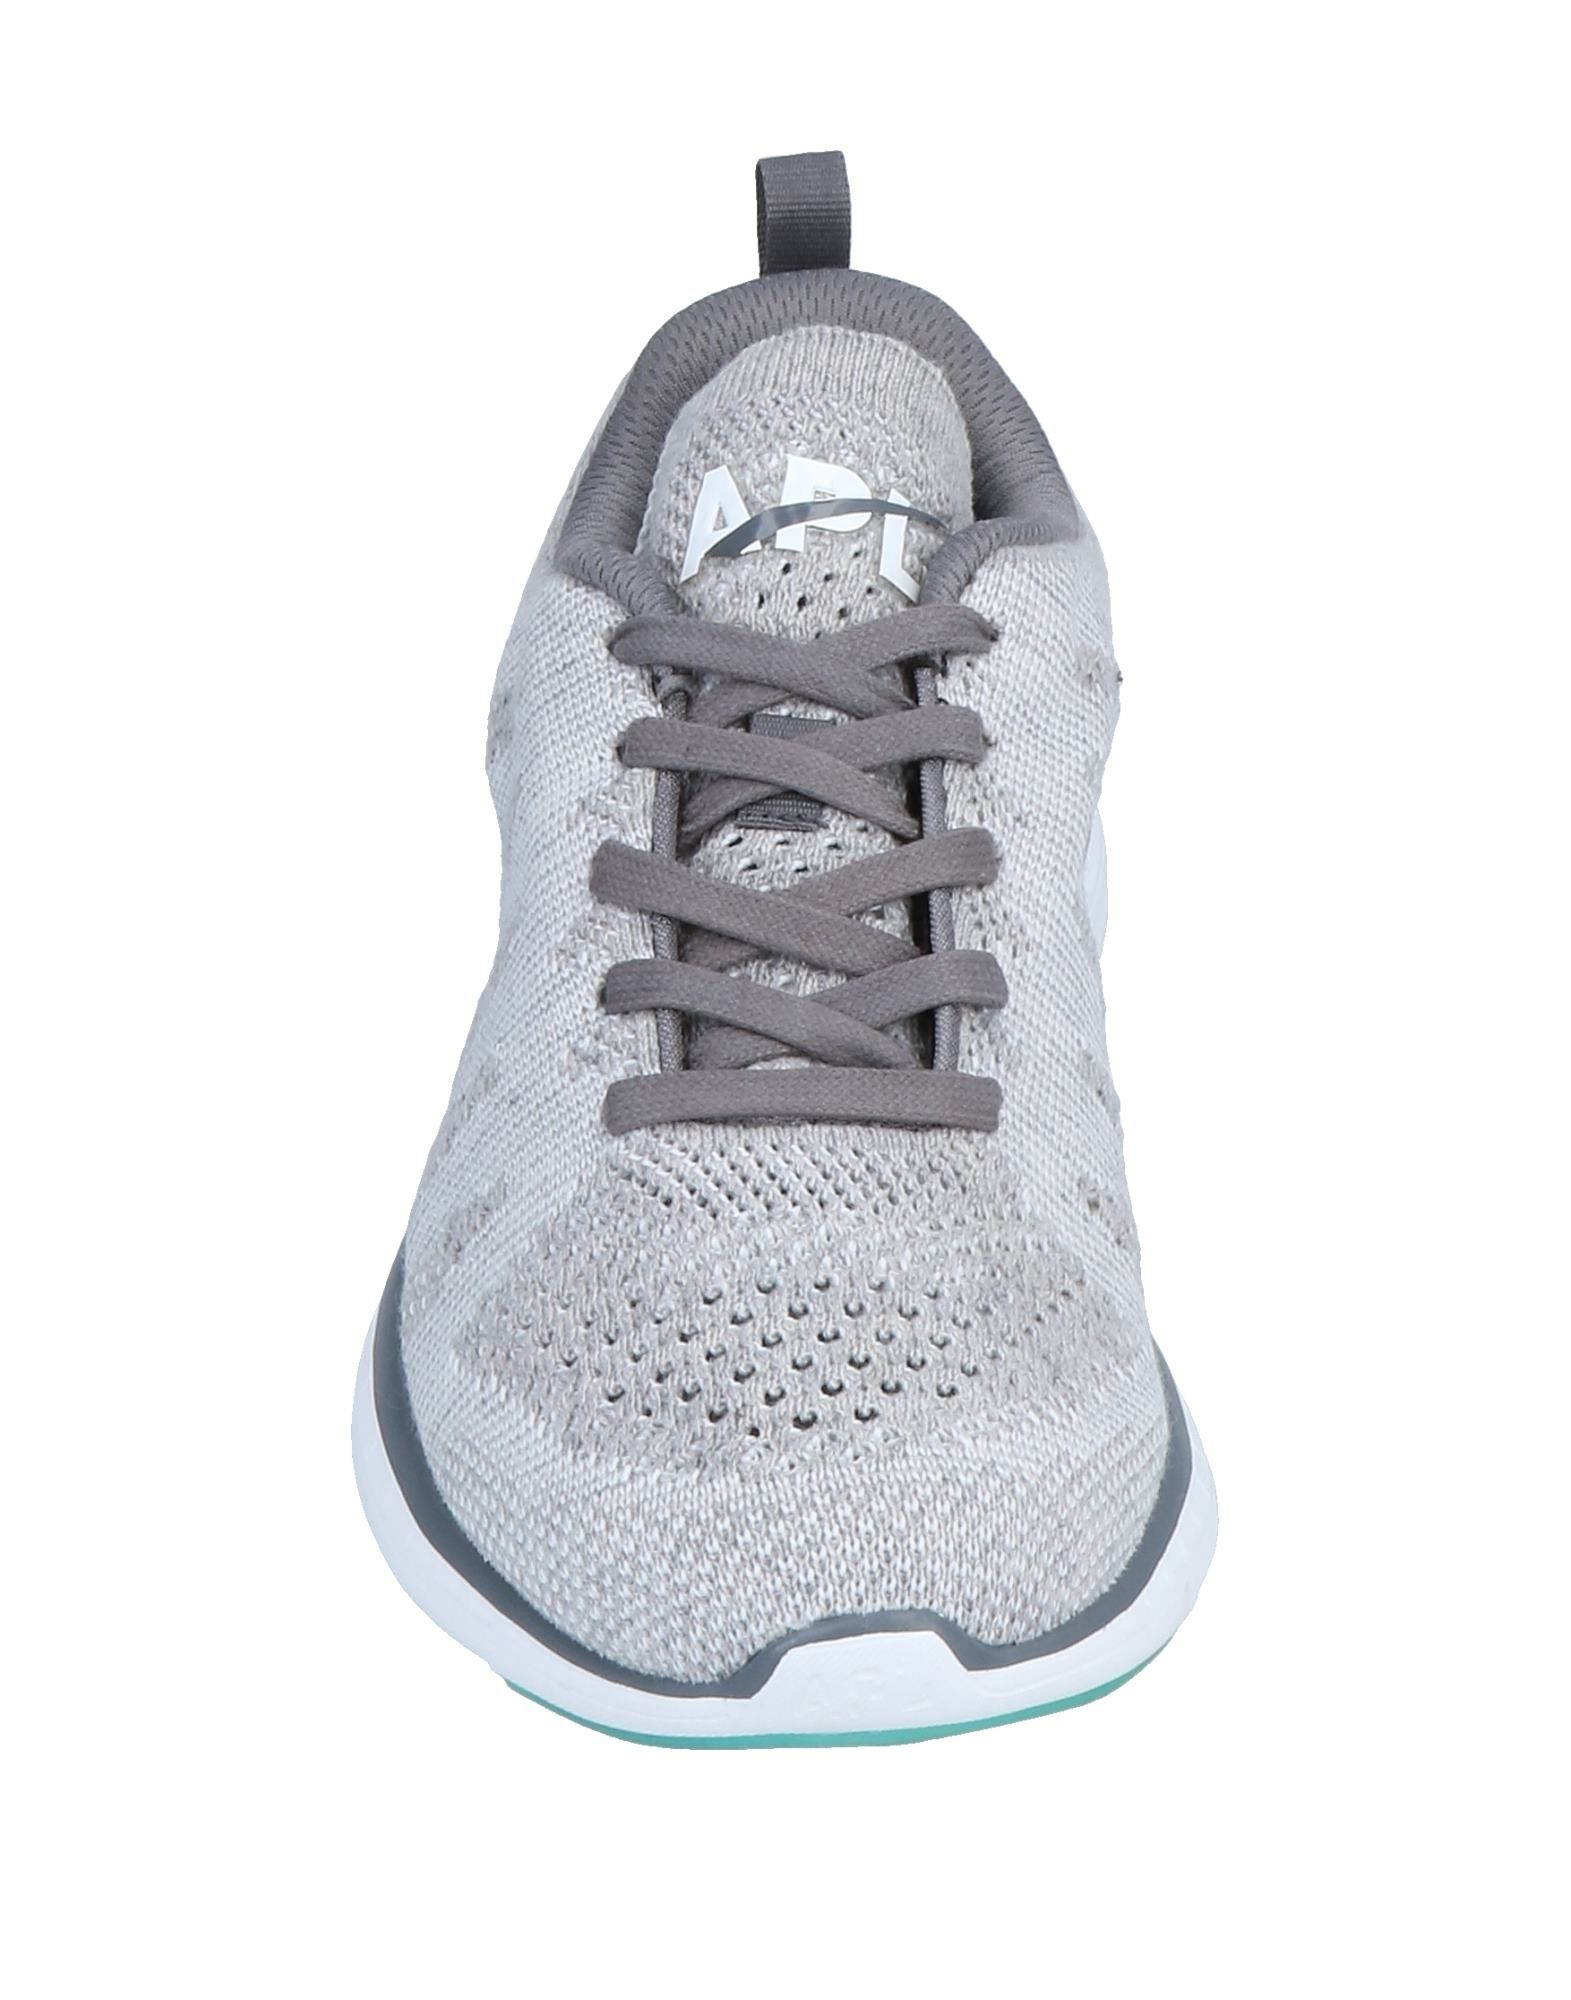 Apl® Athletic Propulsion Labs Sneakers - - - Men Apl® Athletic Propulsion Labs Sneakers online on  United Kingdom - 11558381MH ef37a0